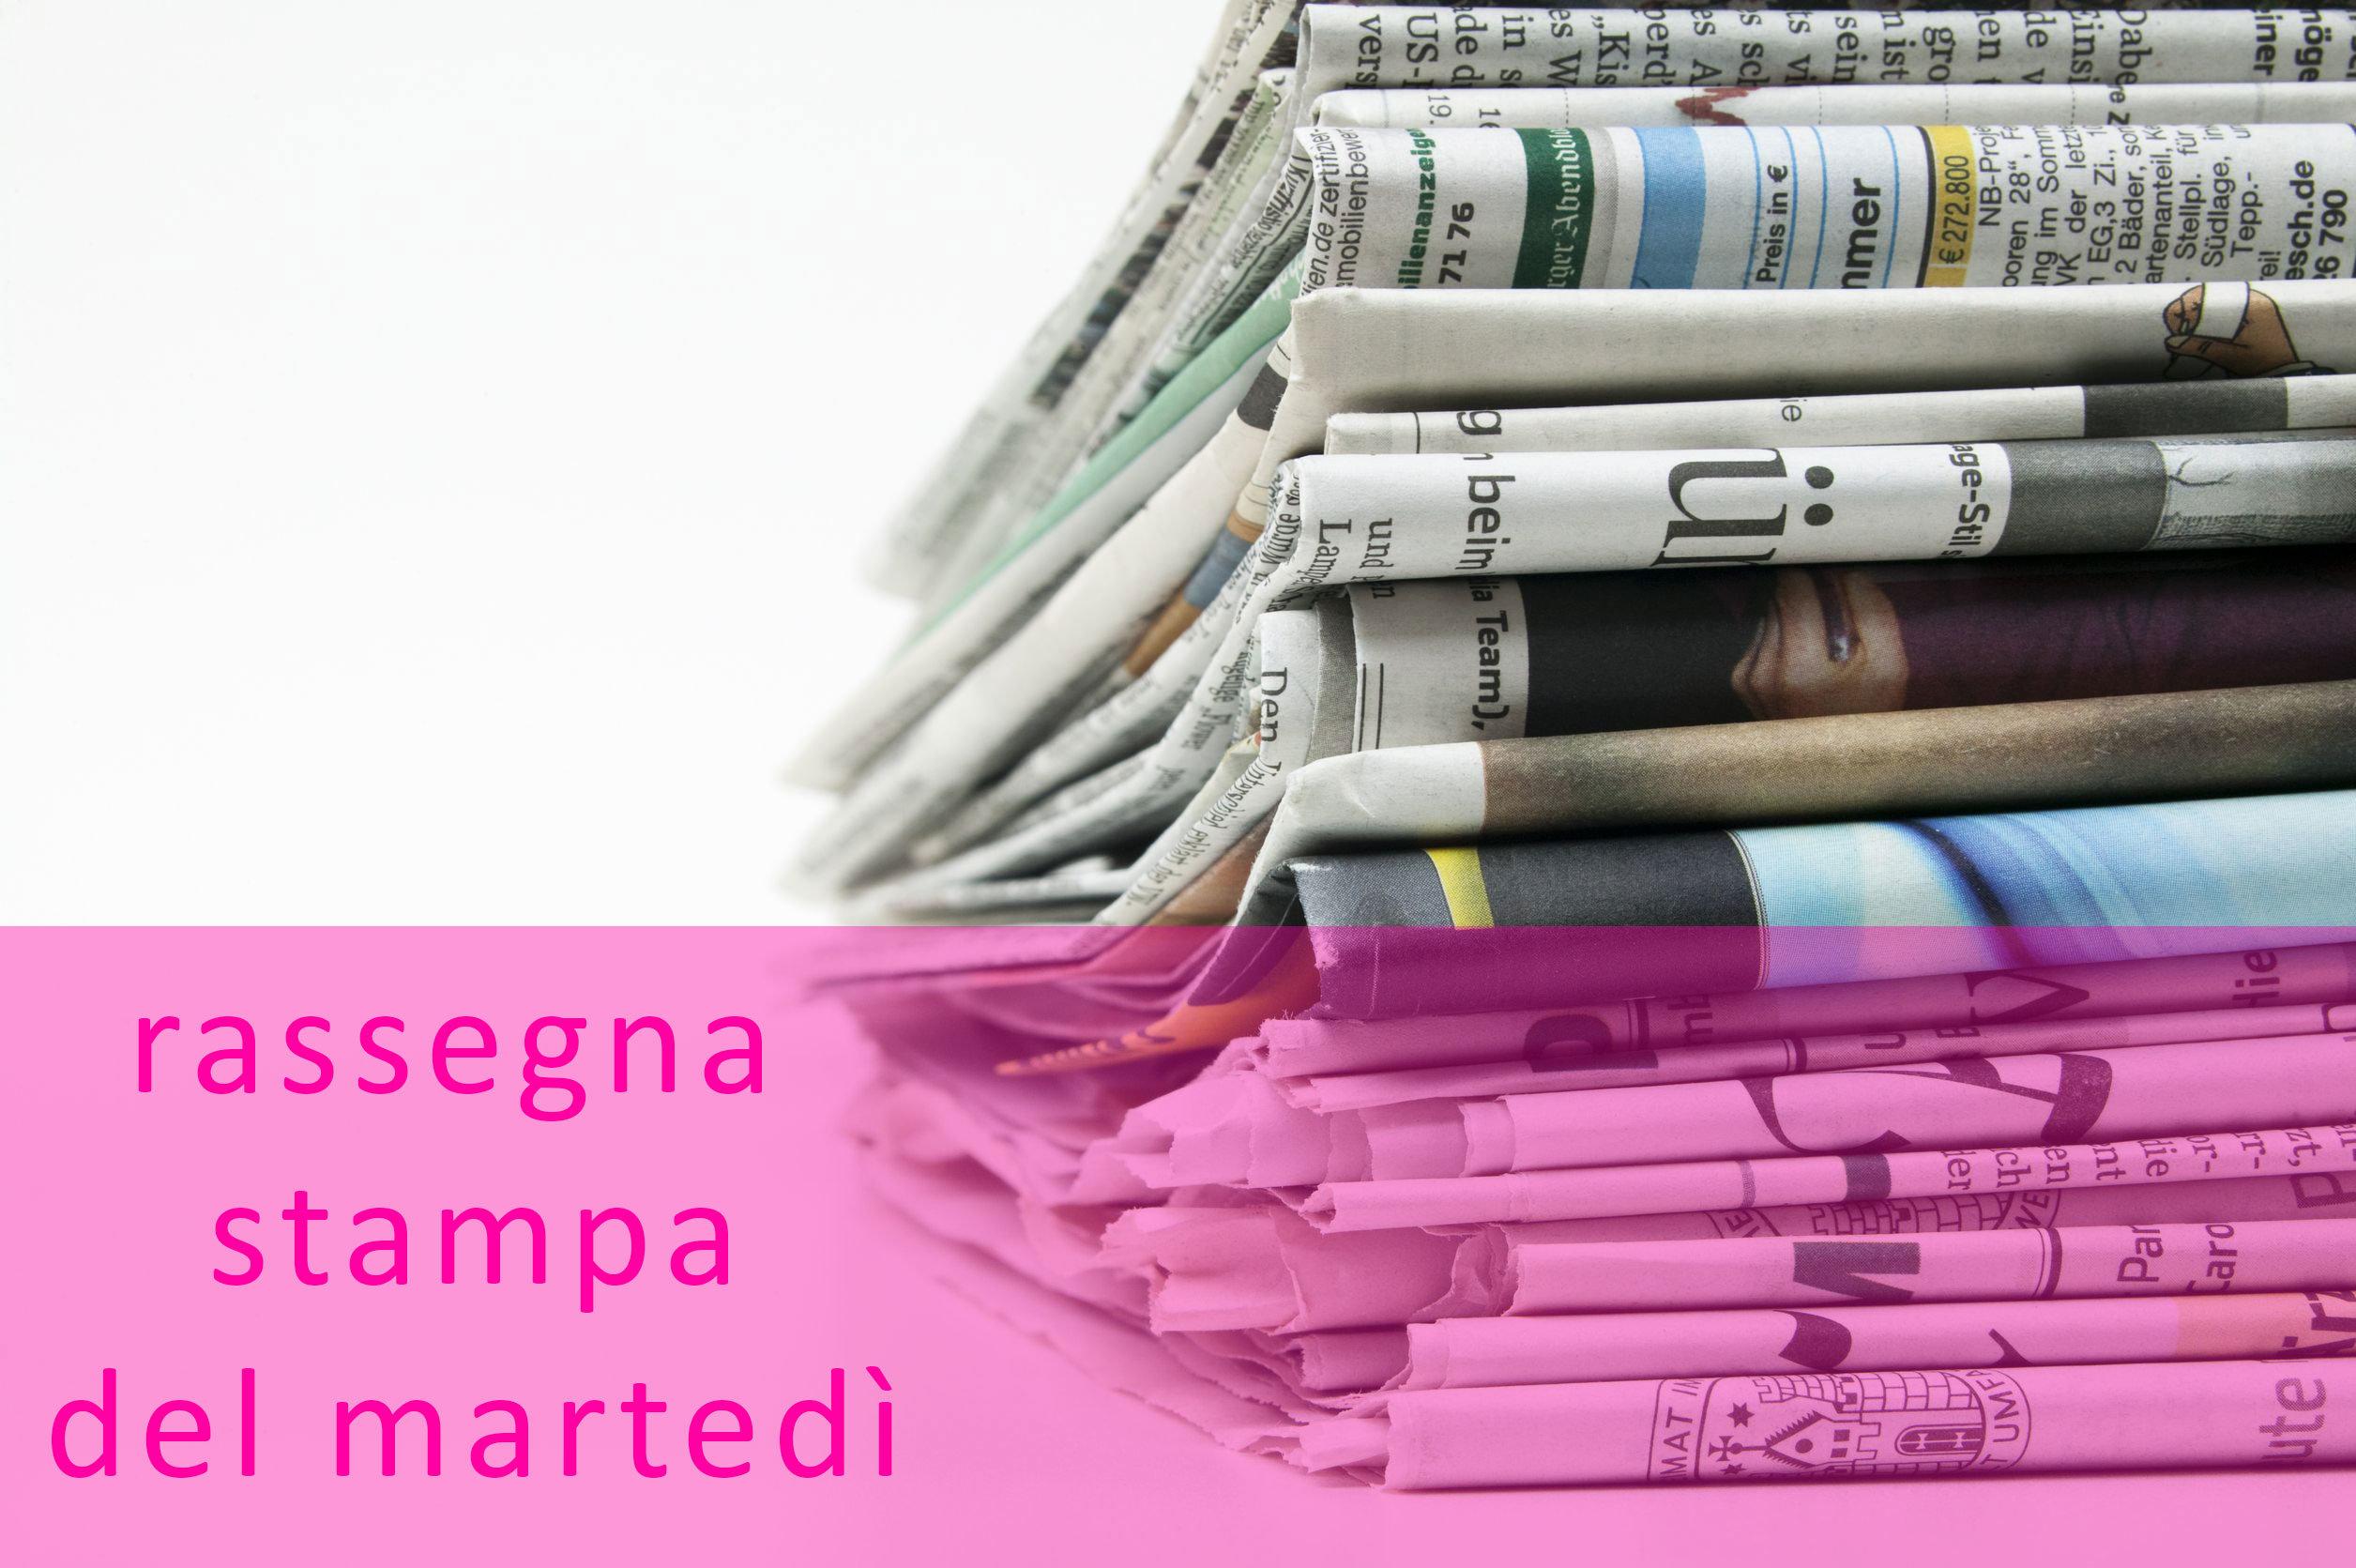 rassegnastampa_martedì